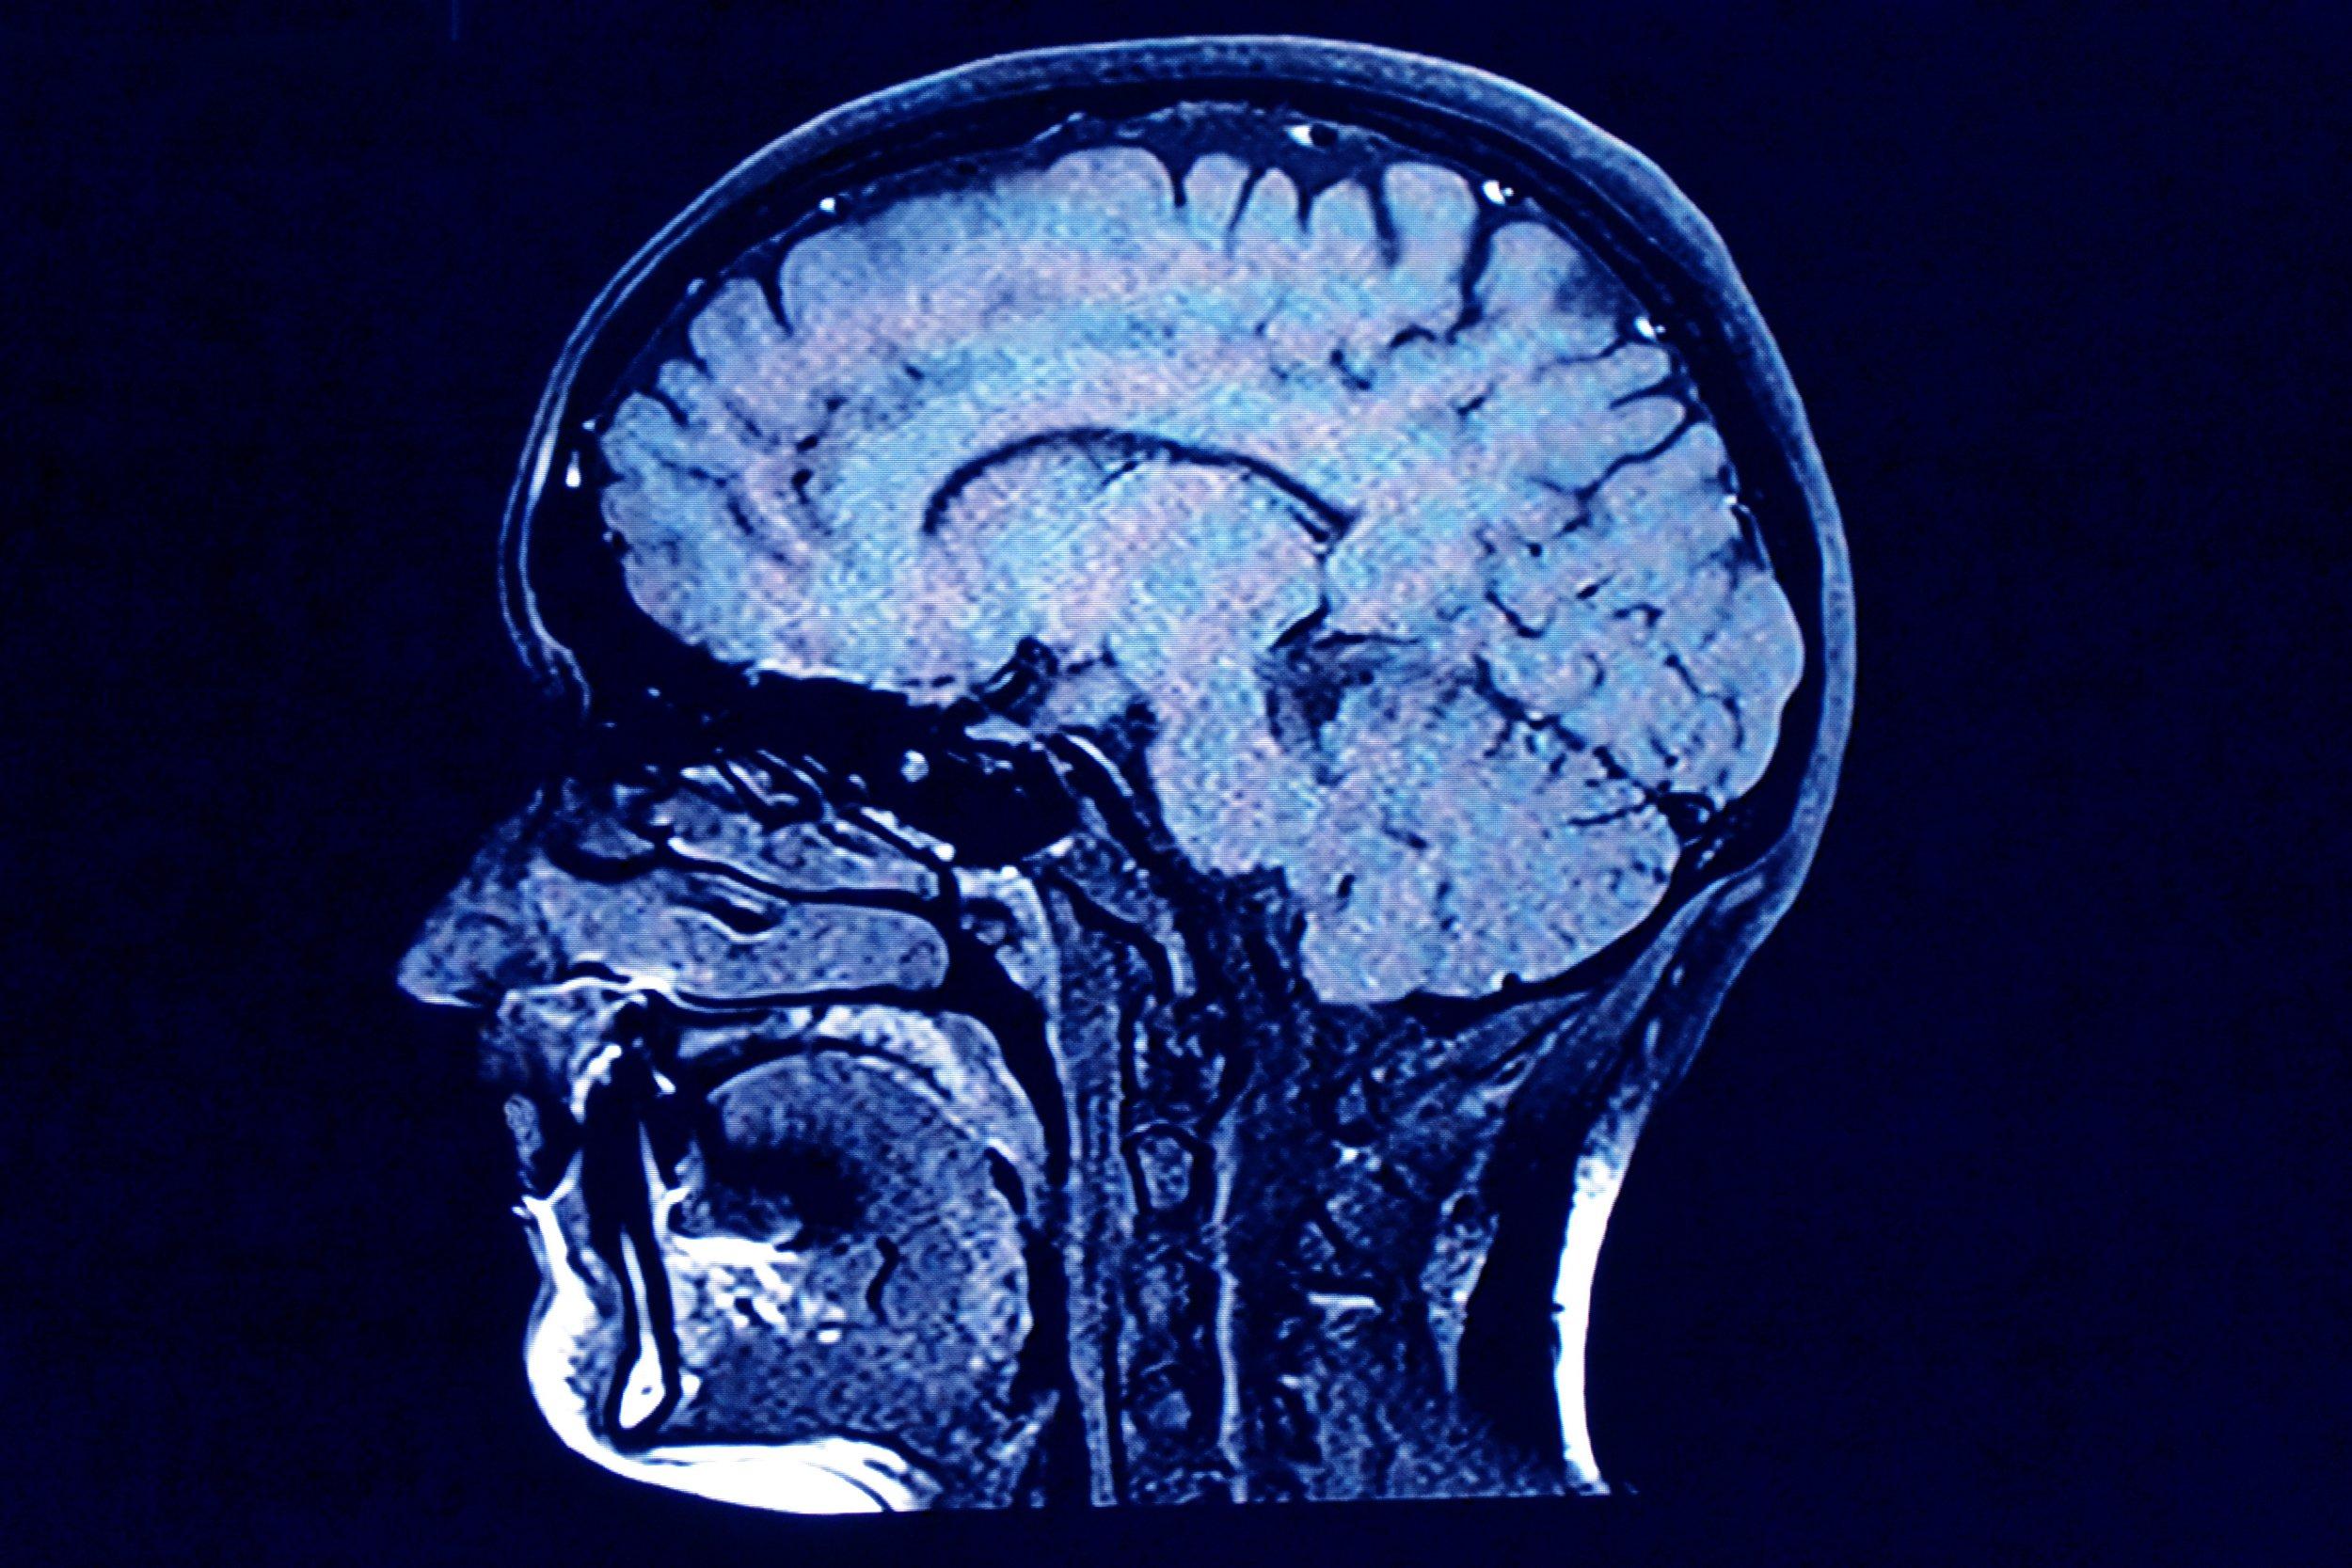 Human head scan, x-ray.